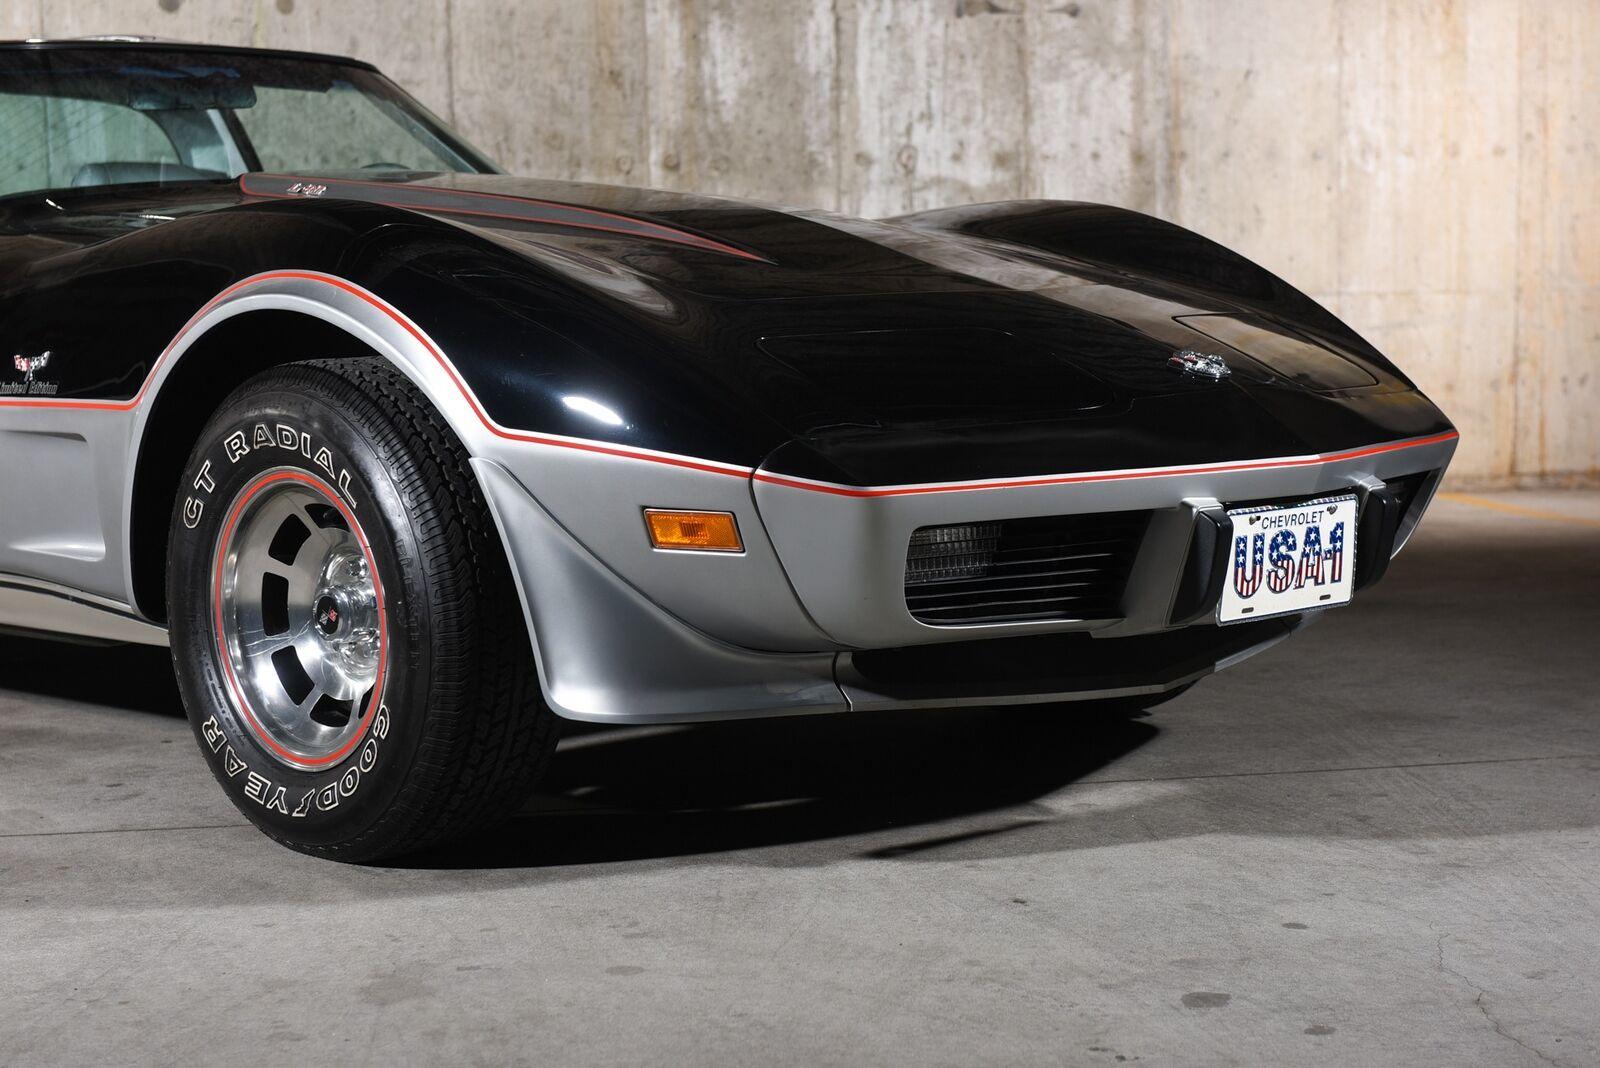 1978 Black Chevrolet Corvette   | C3 Corvette Photo 9